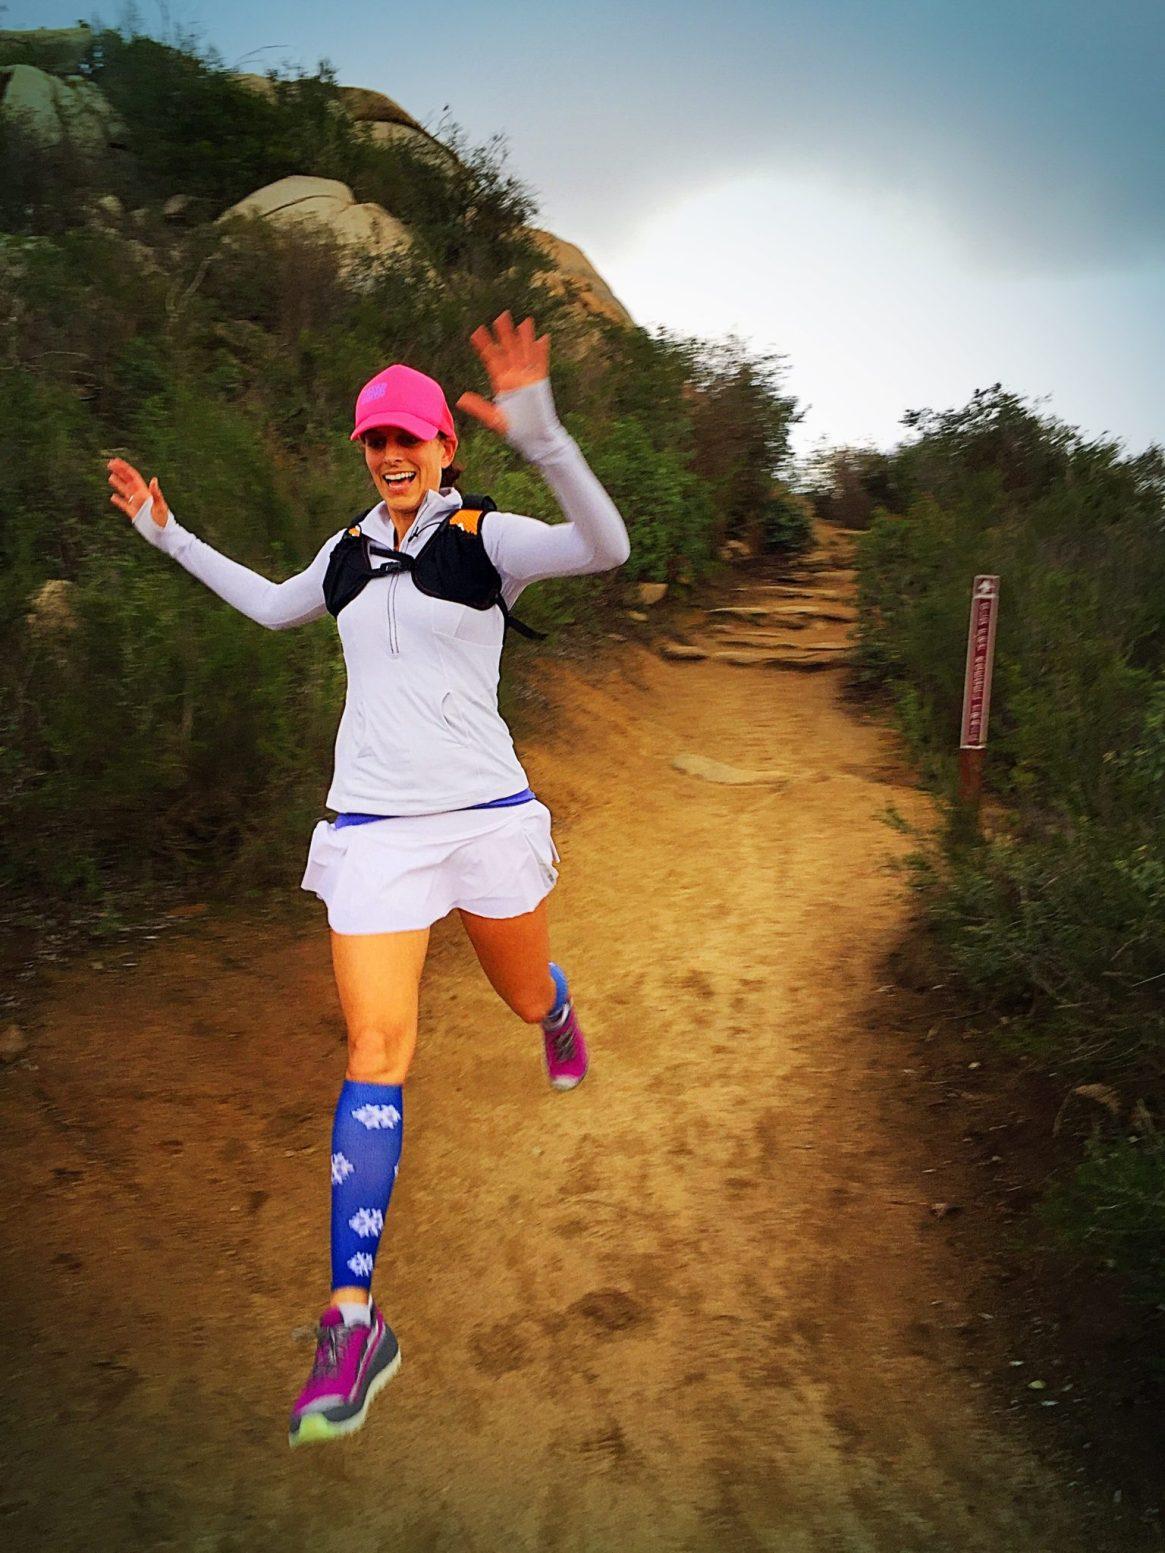 Potato Chip Rock, Mount Woodson Trail, San Diego, Altra Running, Procompression, orange mud, running4thosewhocant, lululemon